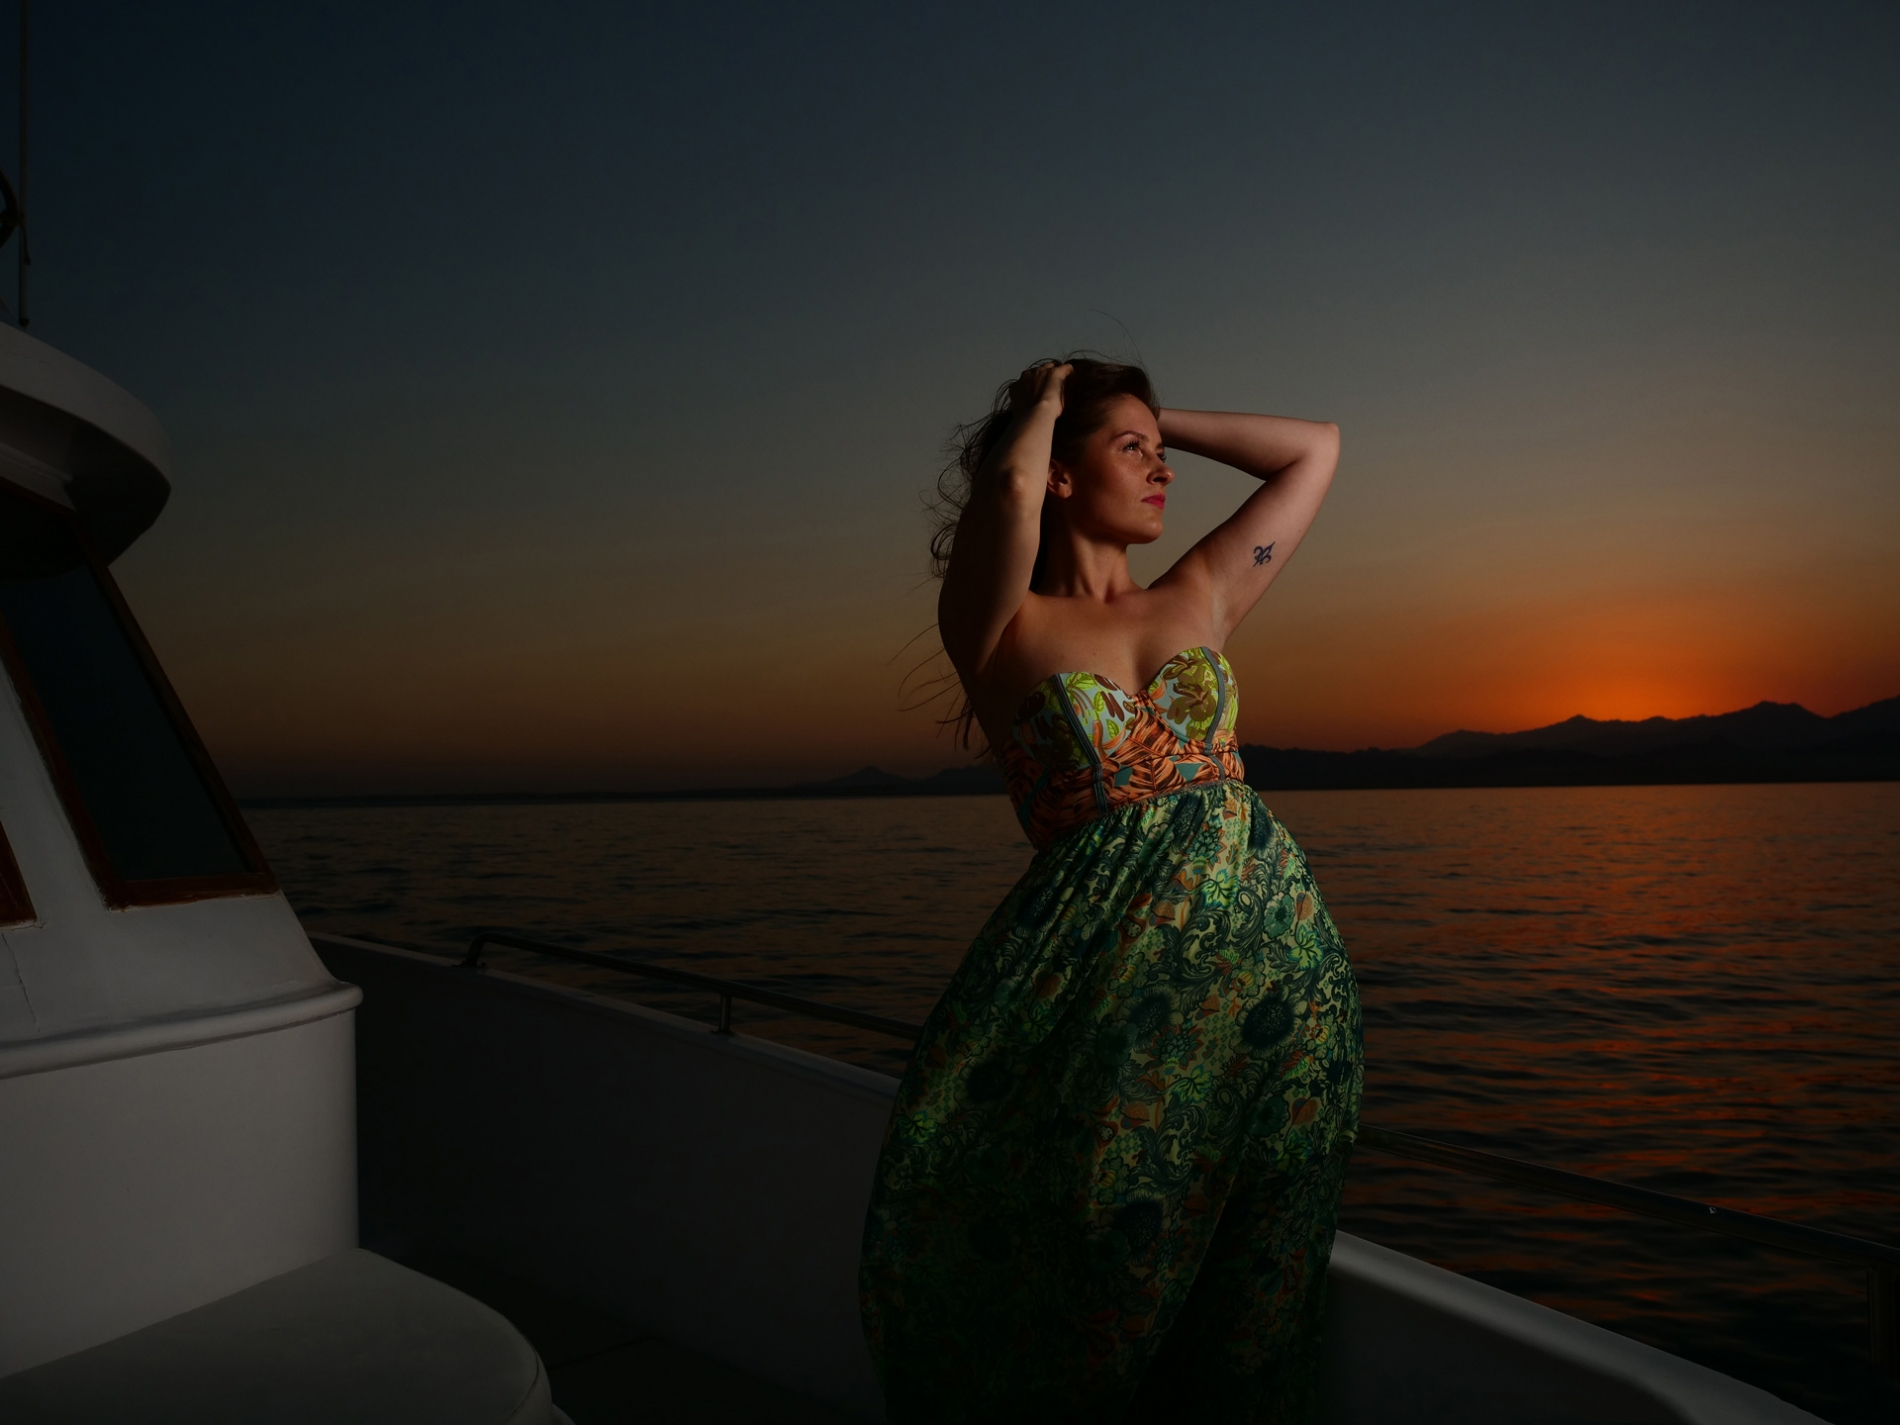 girl-at-sunset